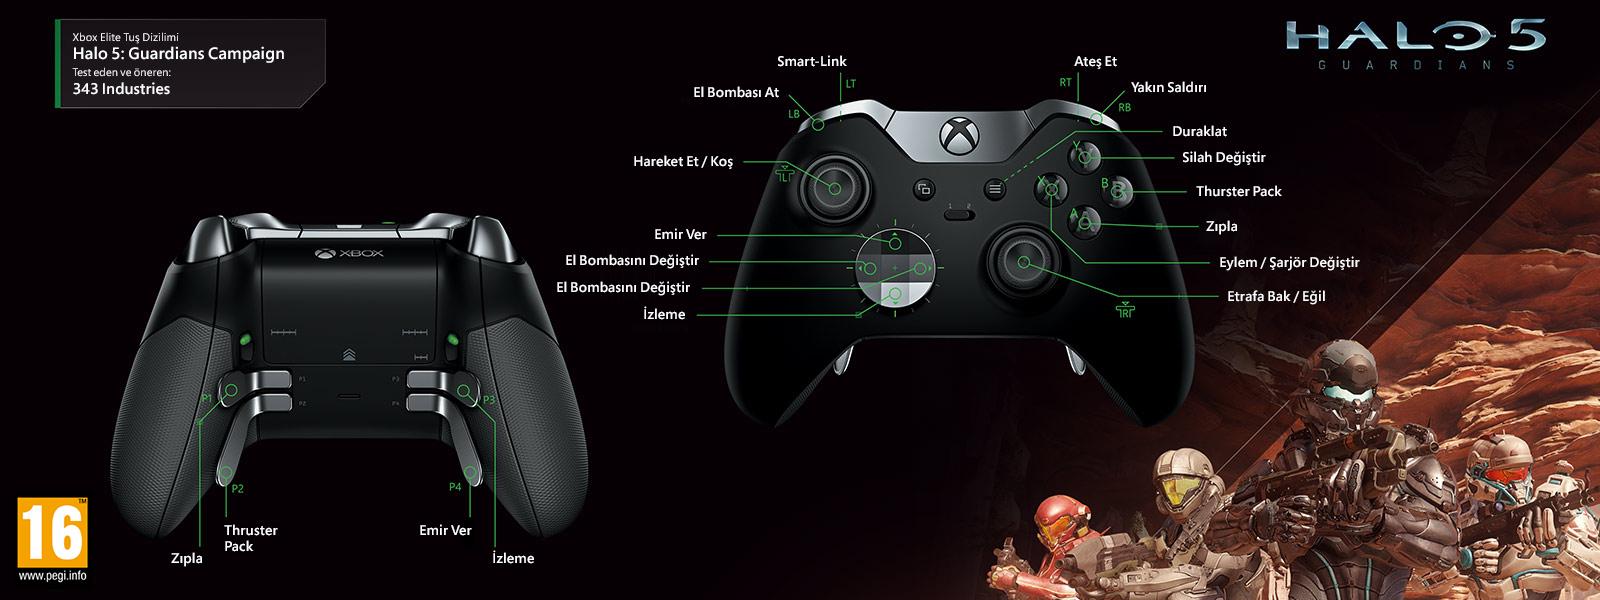 Halo 5 – Guardians Campaign Elite Kontrol Düzeni